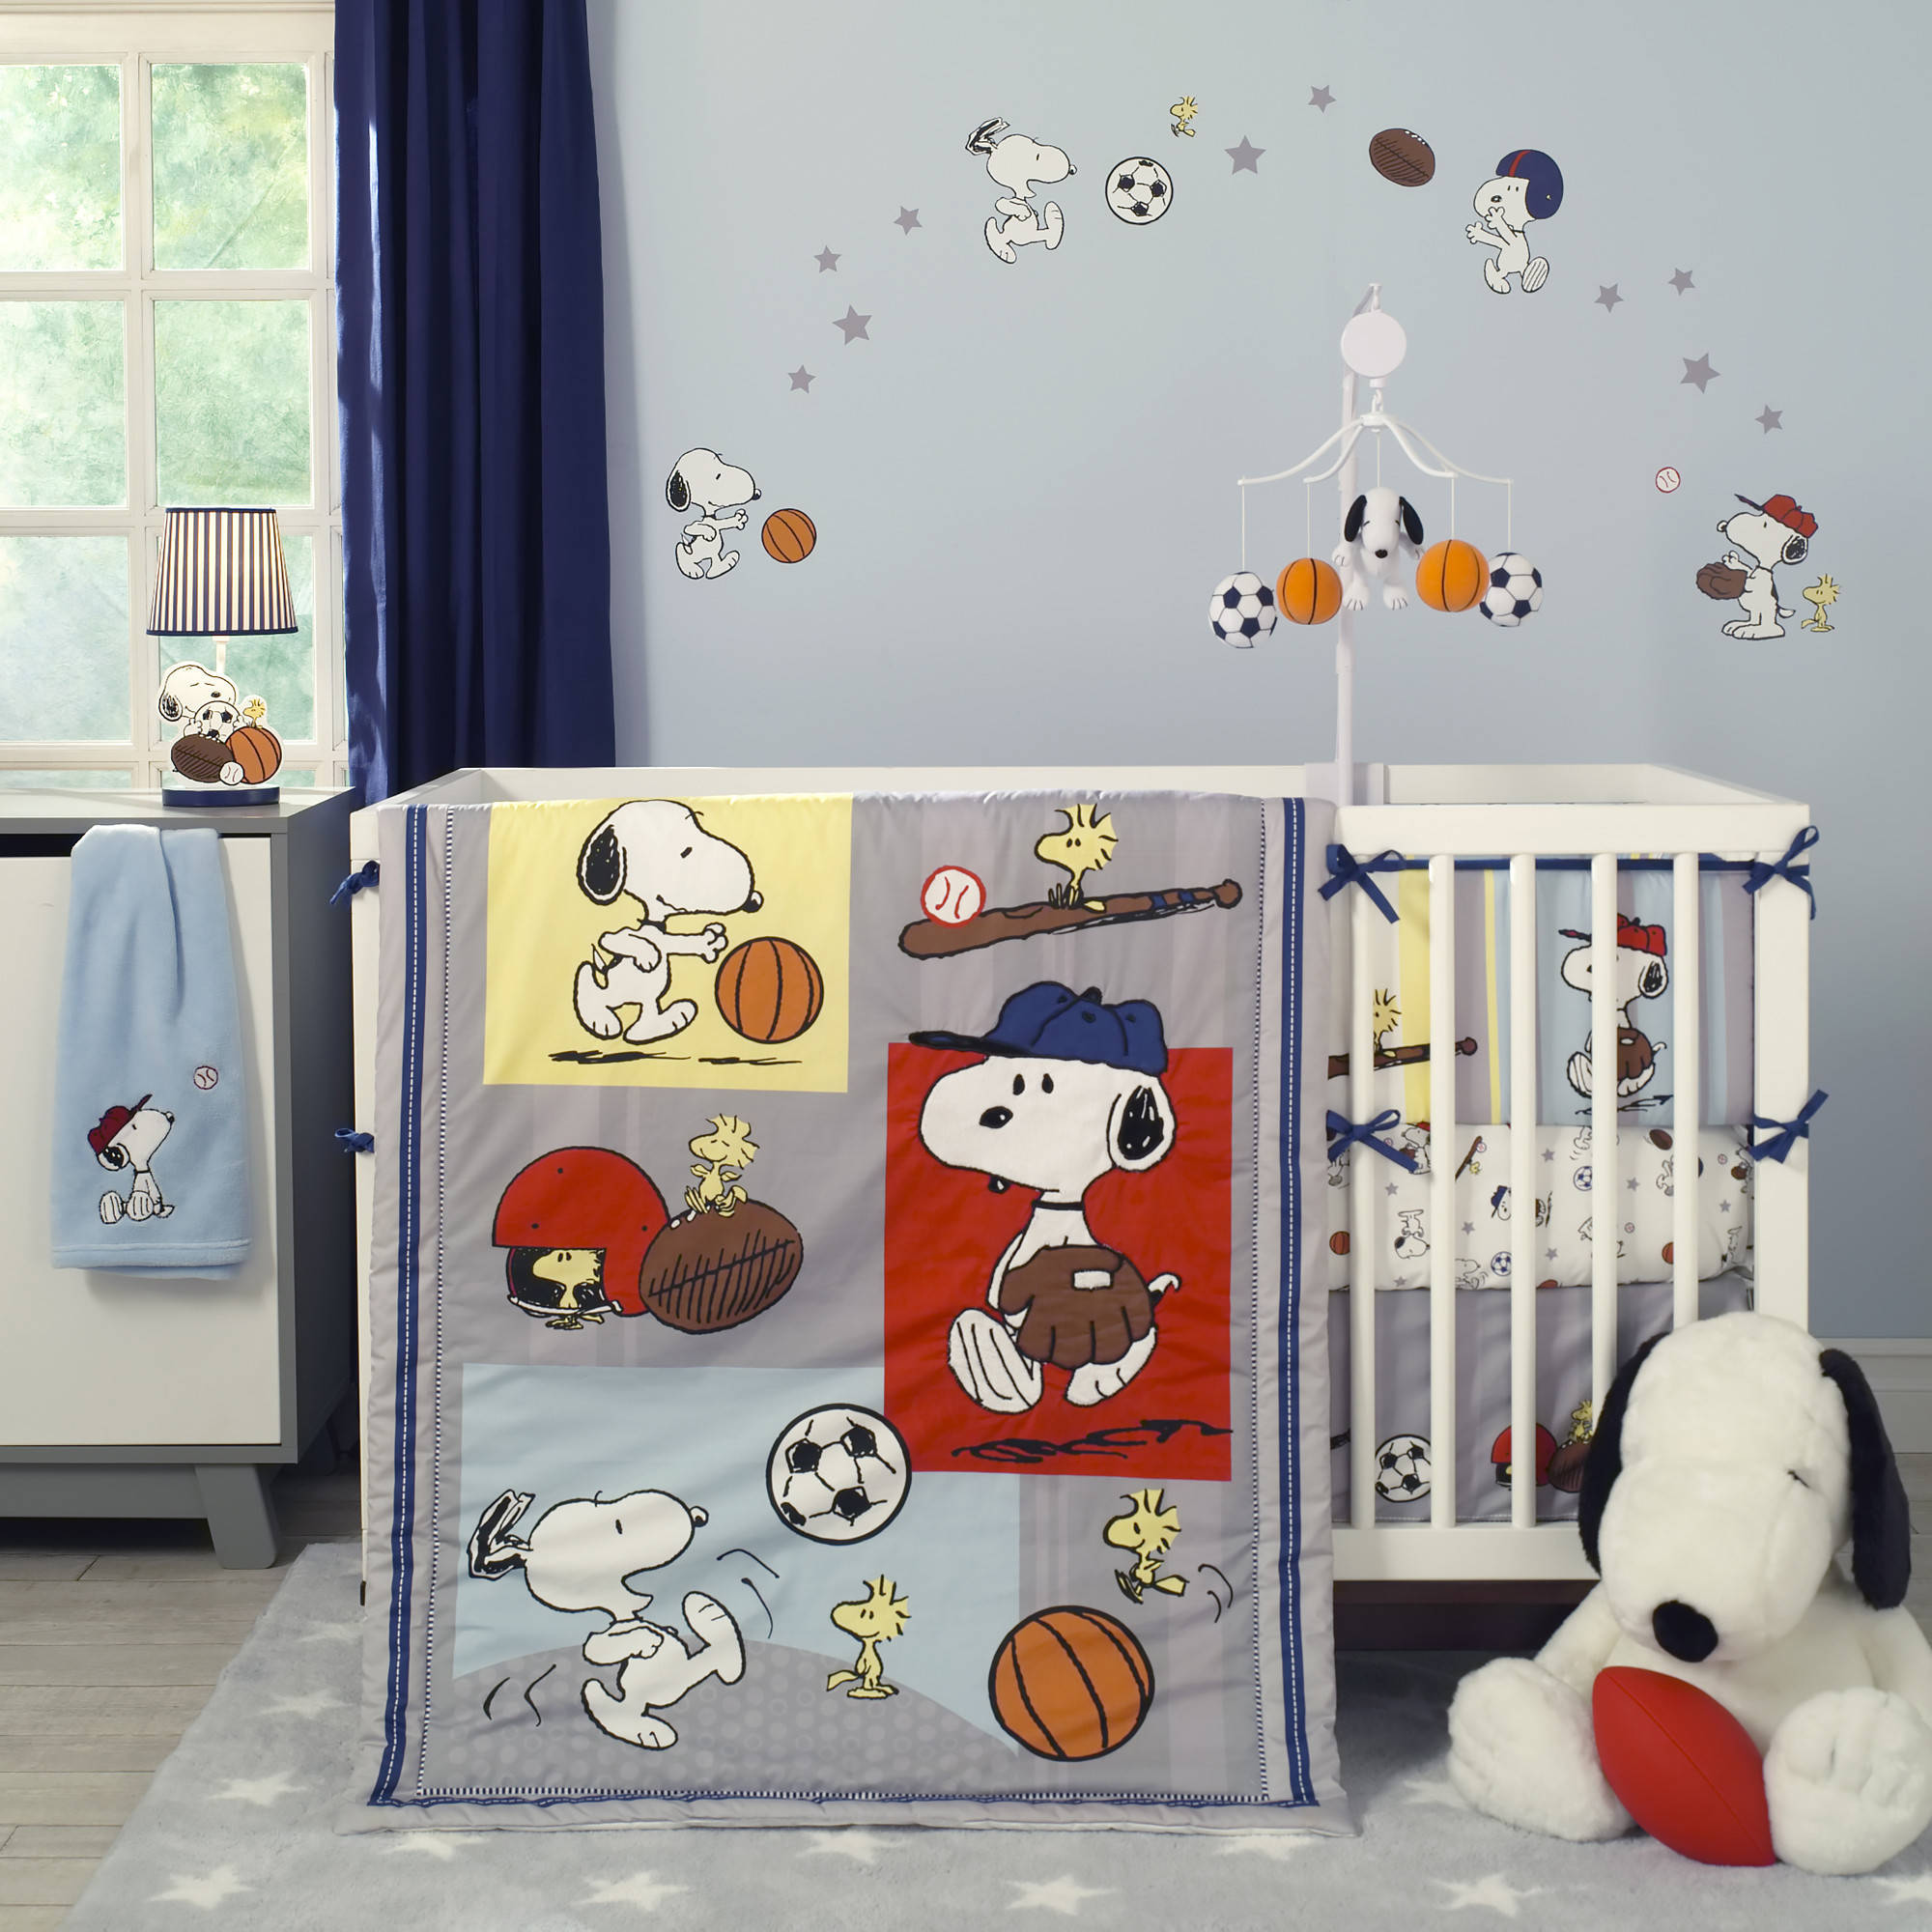 Bedtime Originals Snoopy Sports 3 Piece Crib Bedding Set